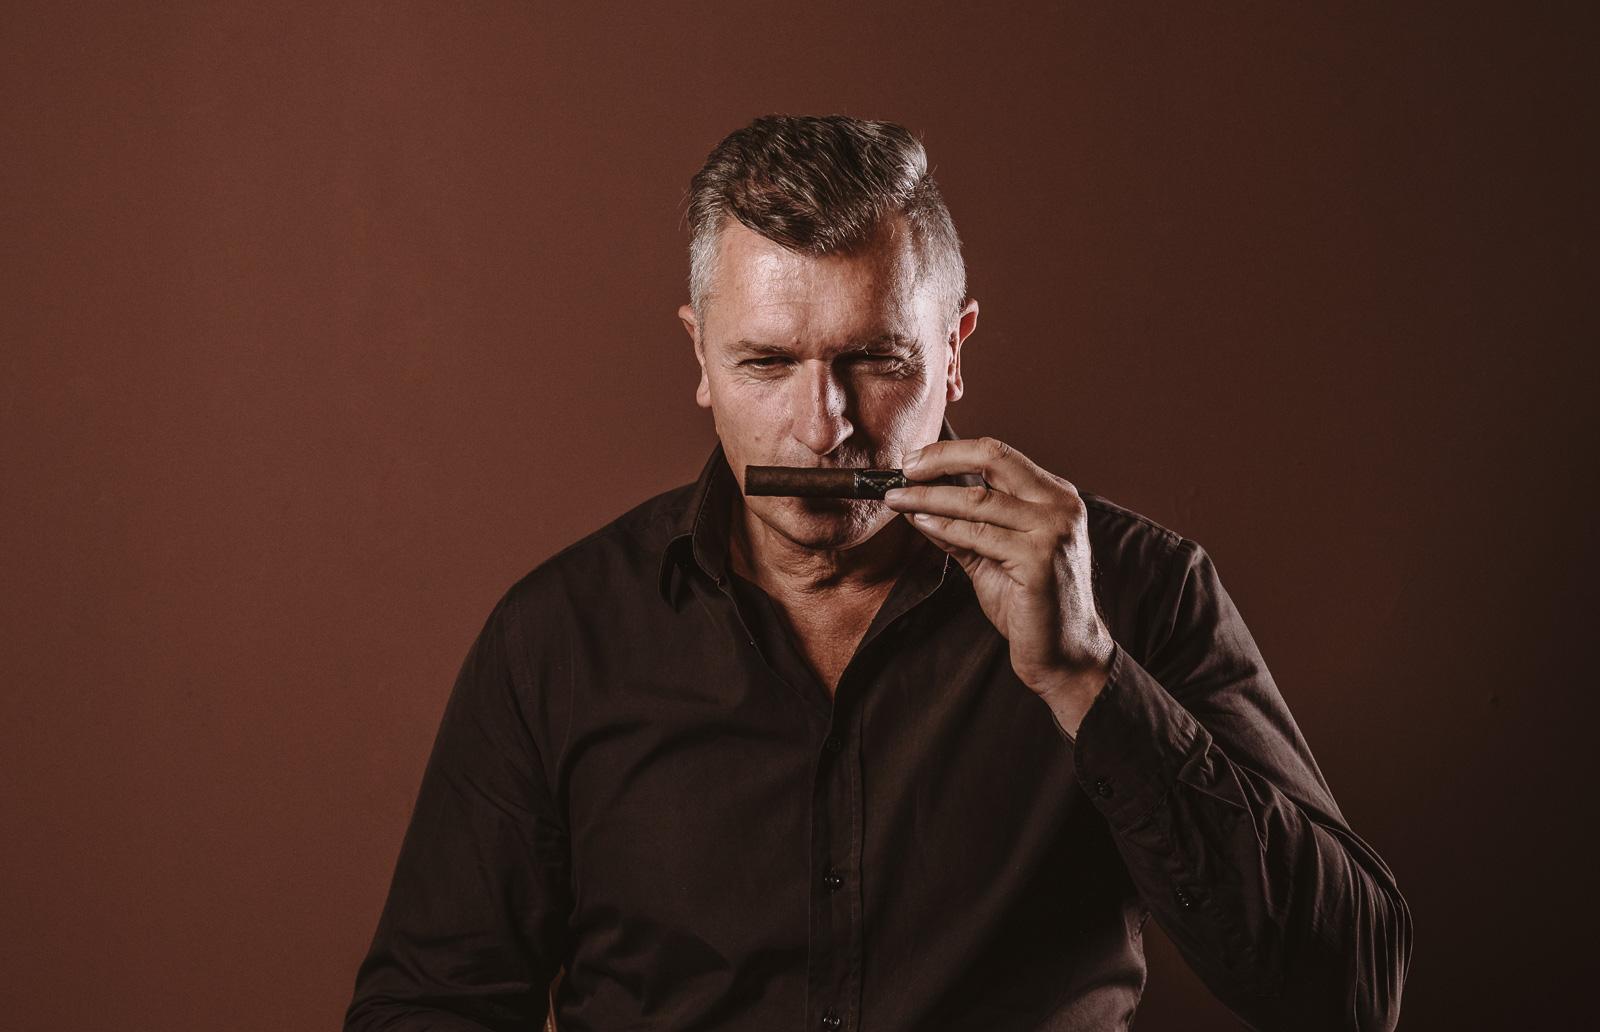 Porträtshooting - Gilbert Köhne vom Konzeptstore Herzblut riecht an Zigarre